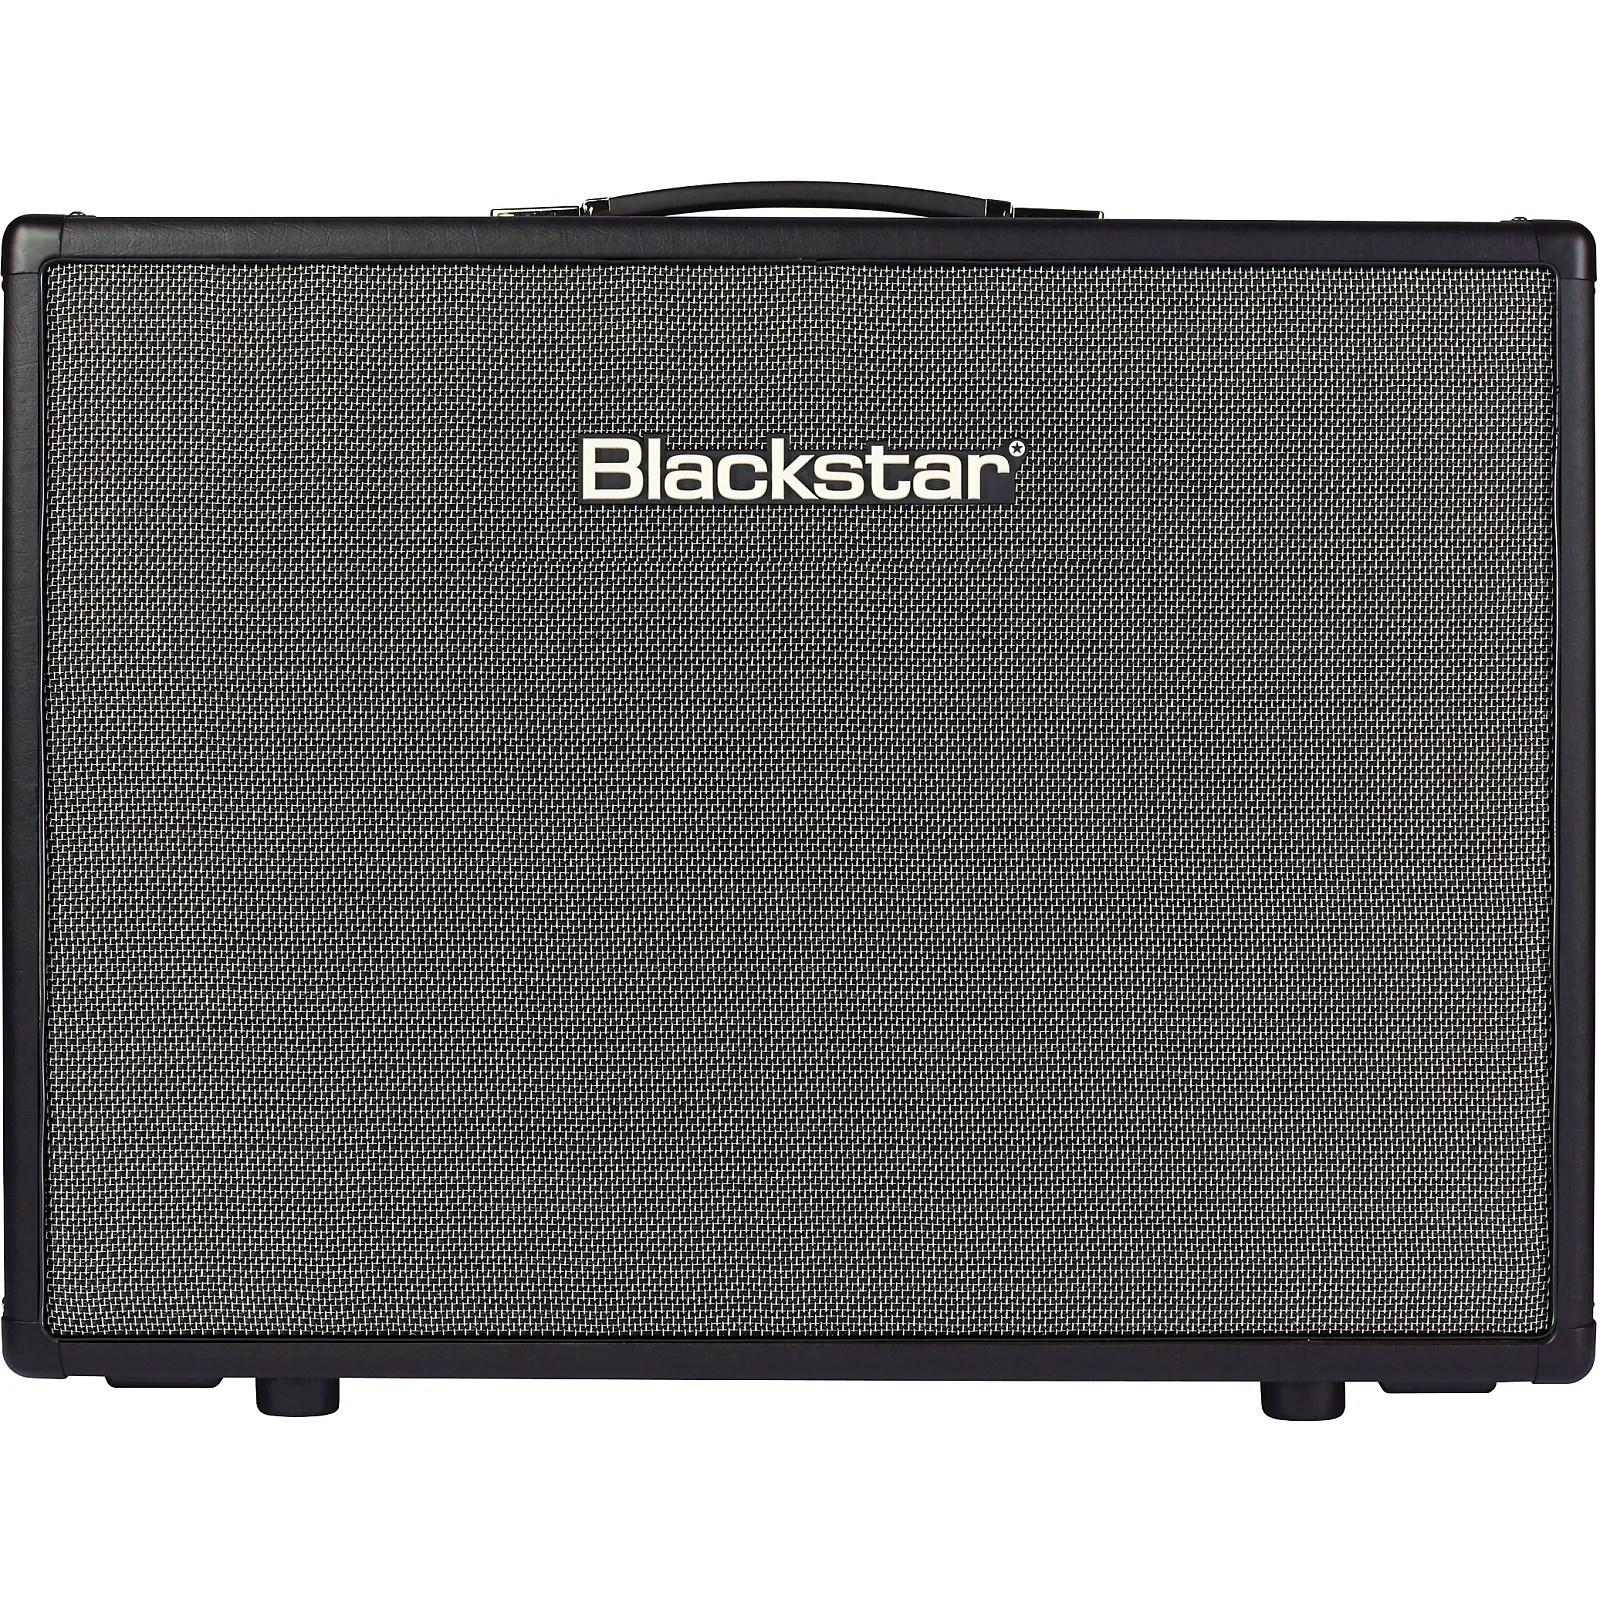 Blackstar Htv212 Guitar Speaker Cabinet 160 Watts 2x12quot